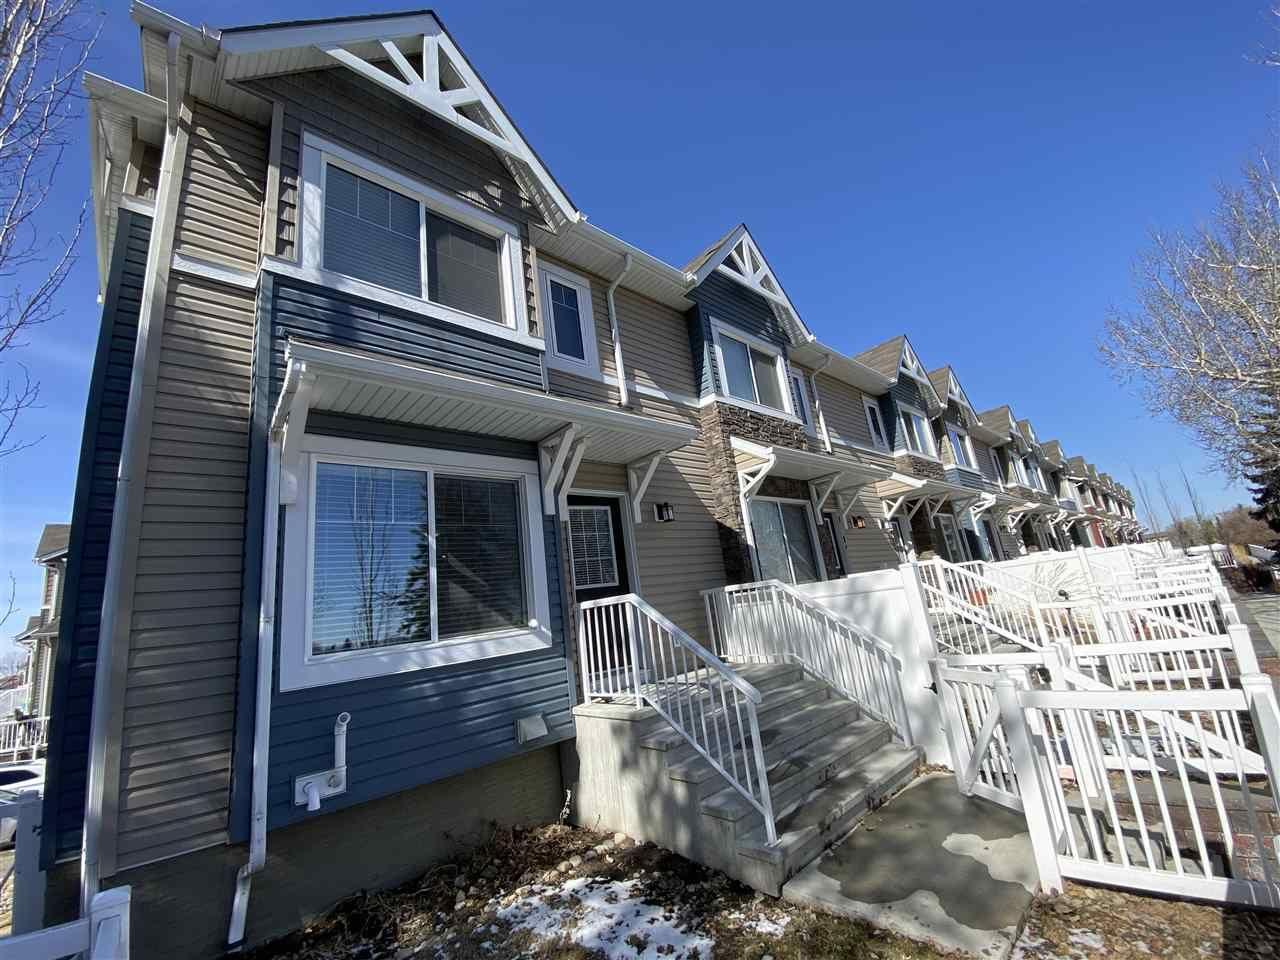 Main Photo: 15 14621 121 Street in Edmonton: Zone 27 Townhouse for sale : MLS®# E4235704